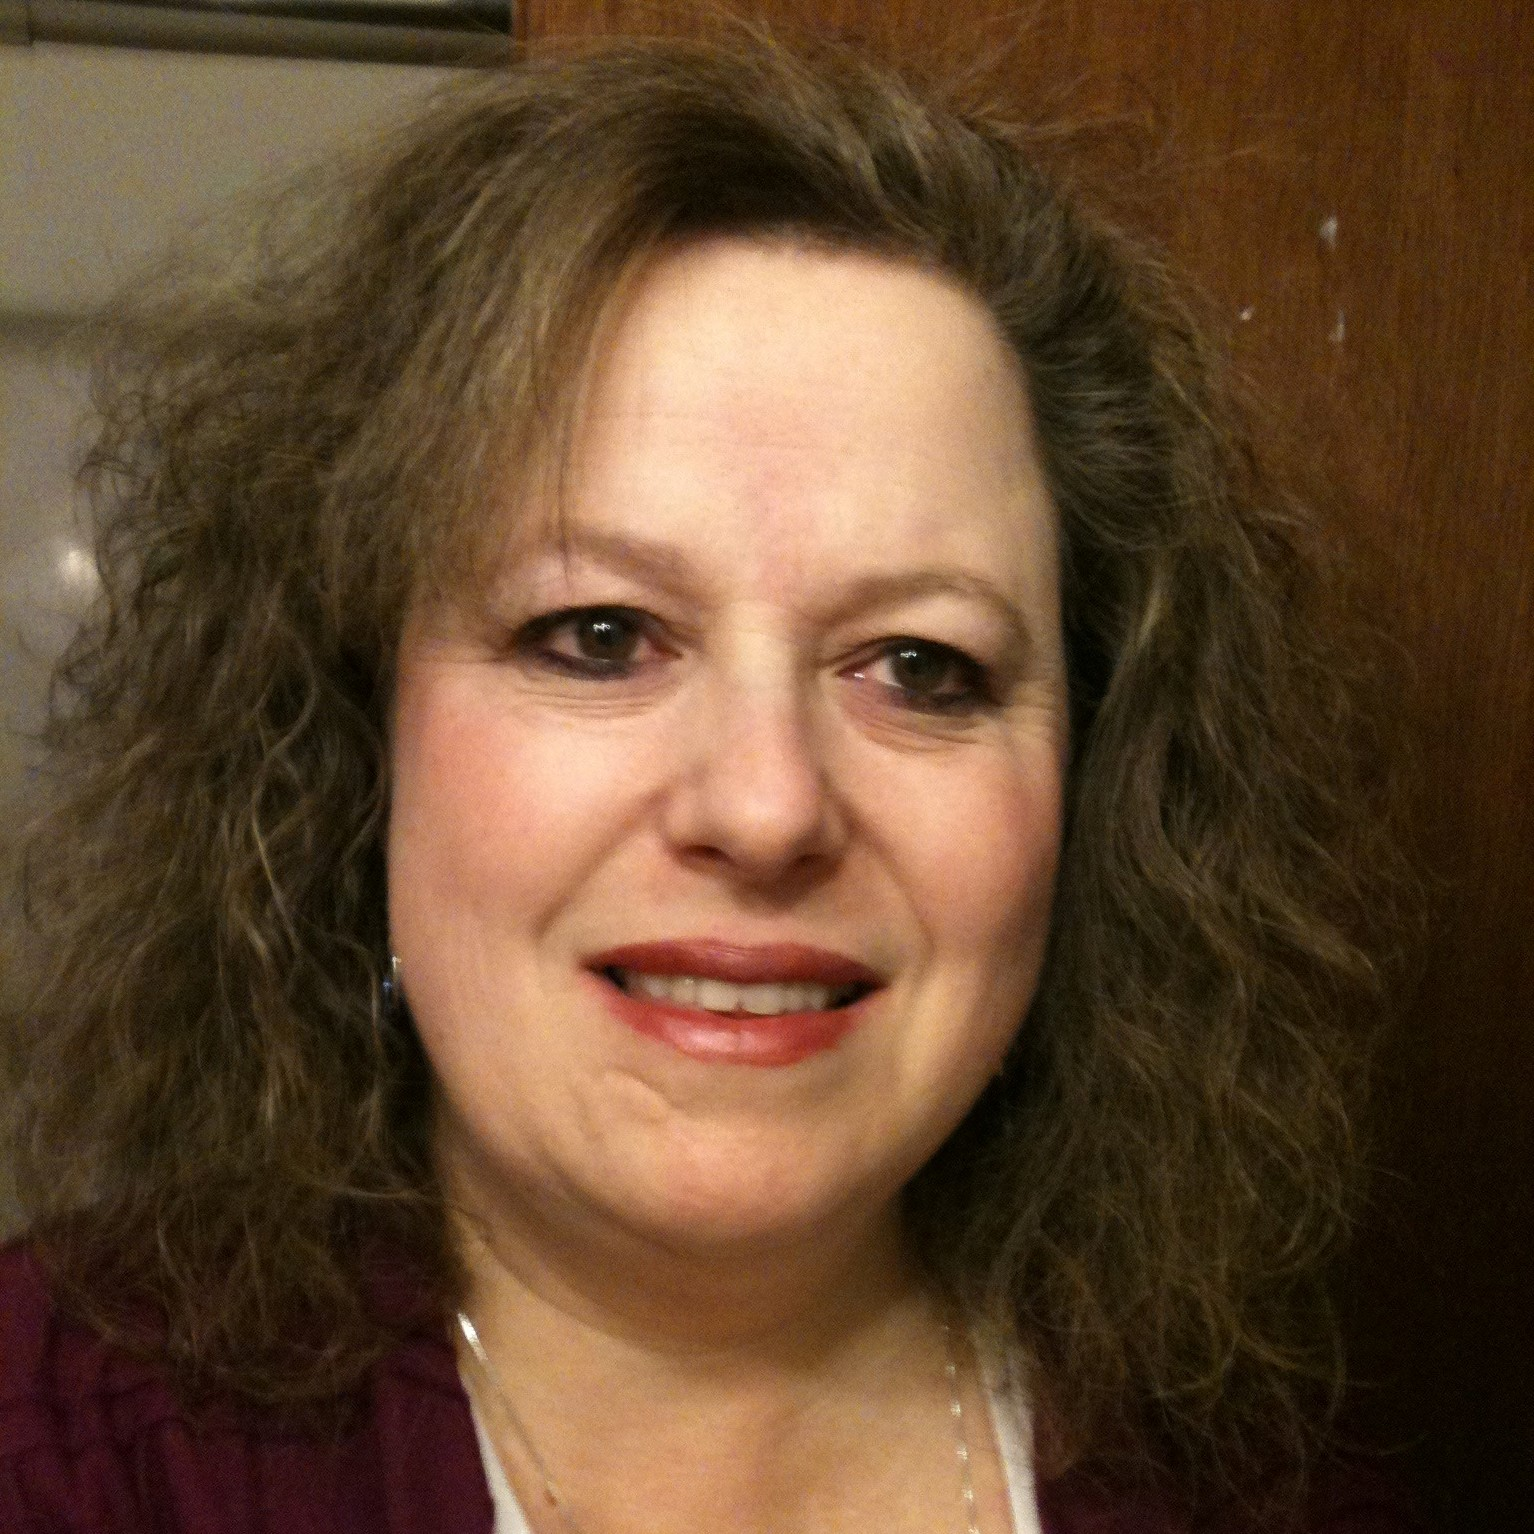 File Clerk - Diana Clark: - dianac@gmssi.org